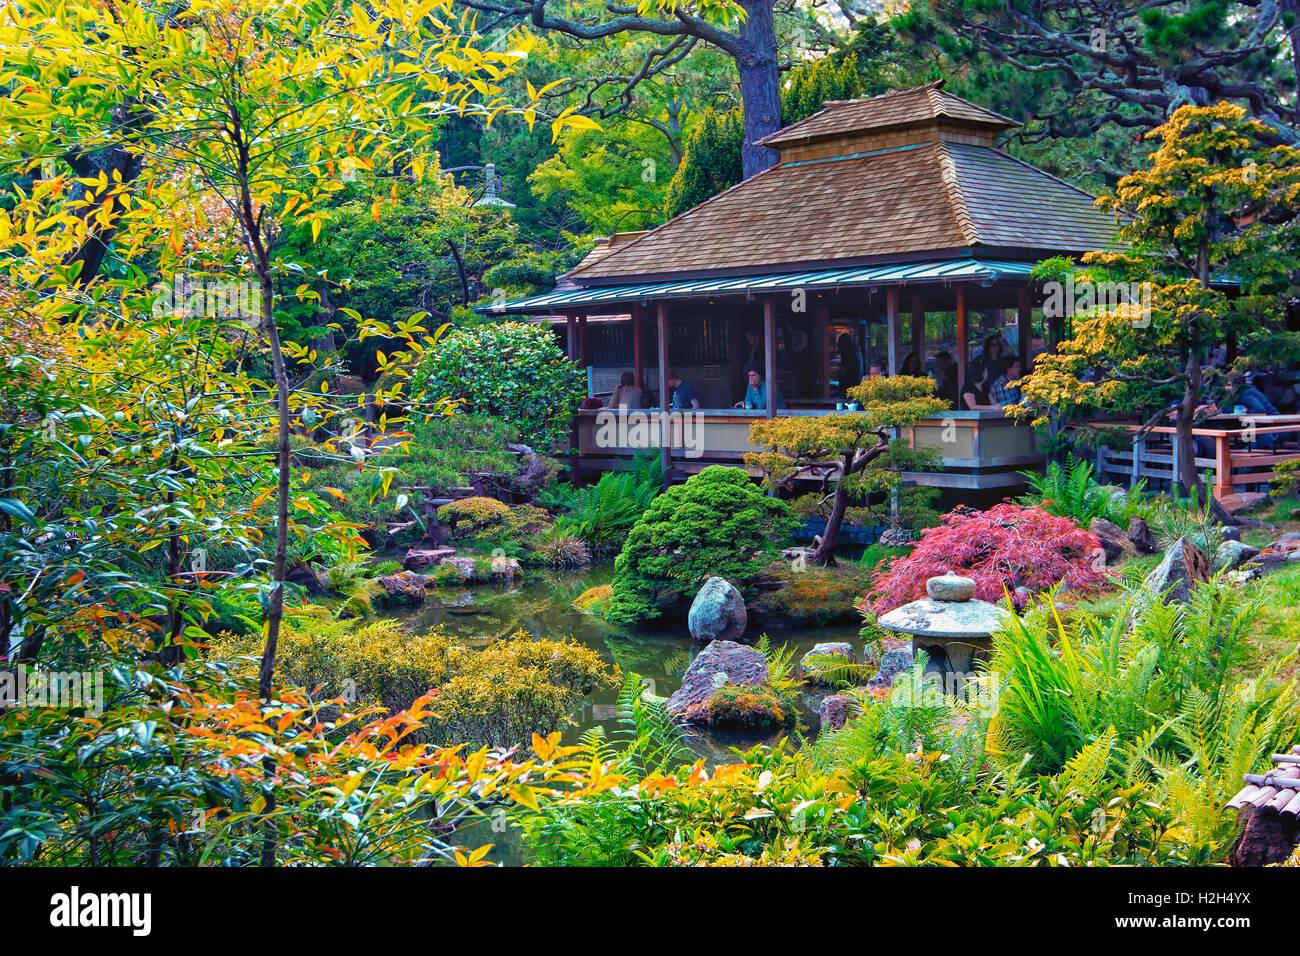 Japanischer Garten im Golden Gate Park, San Francisco Stockbild